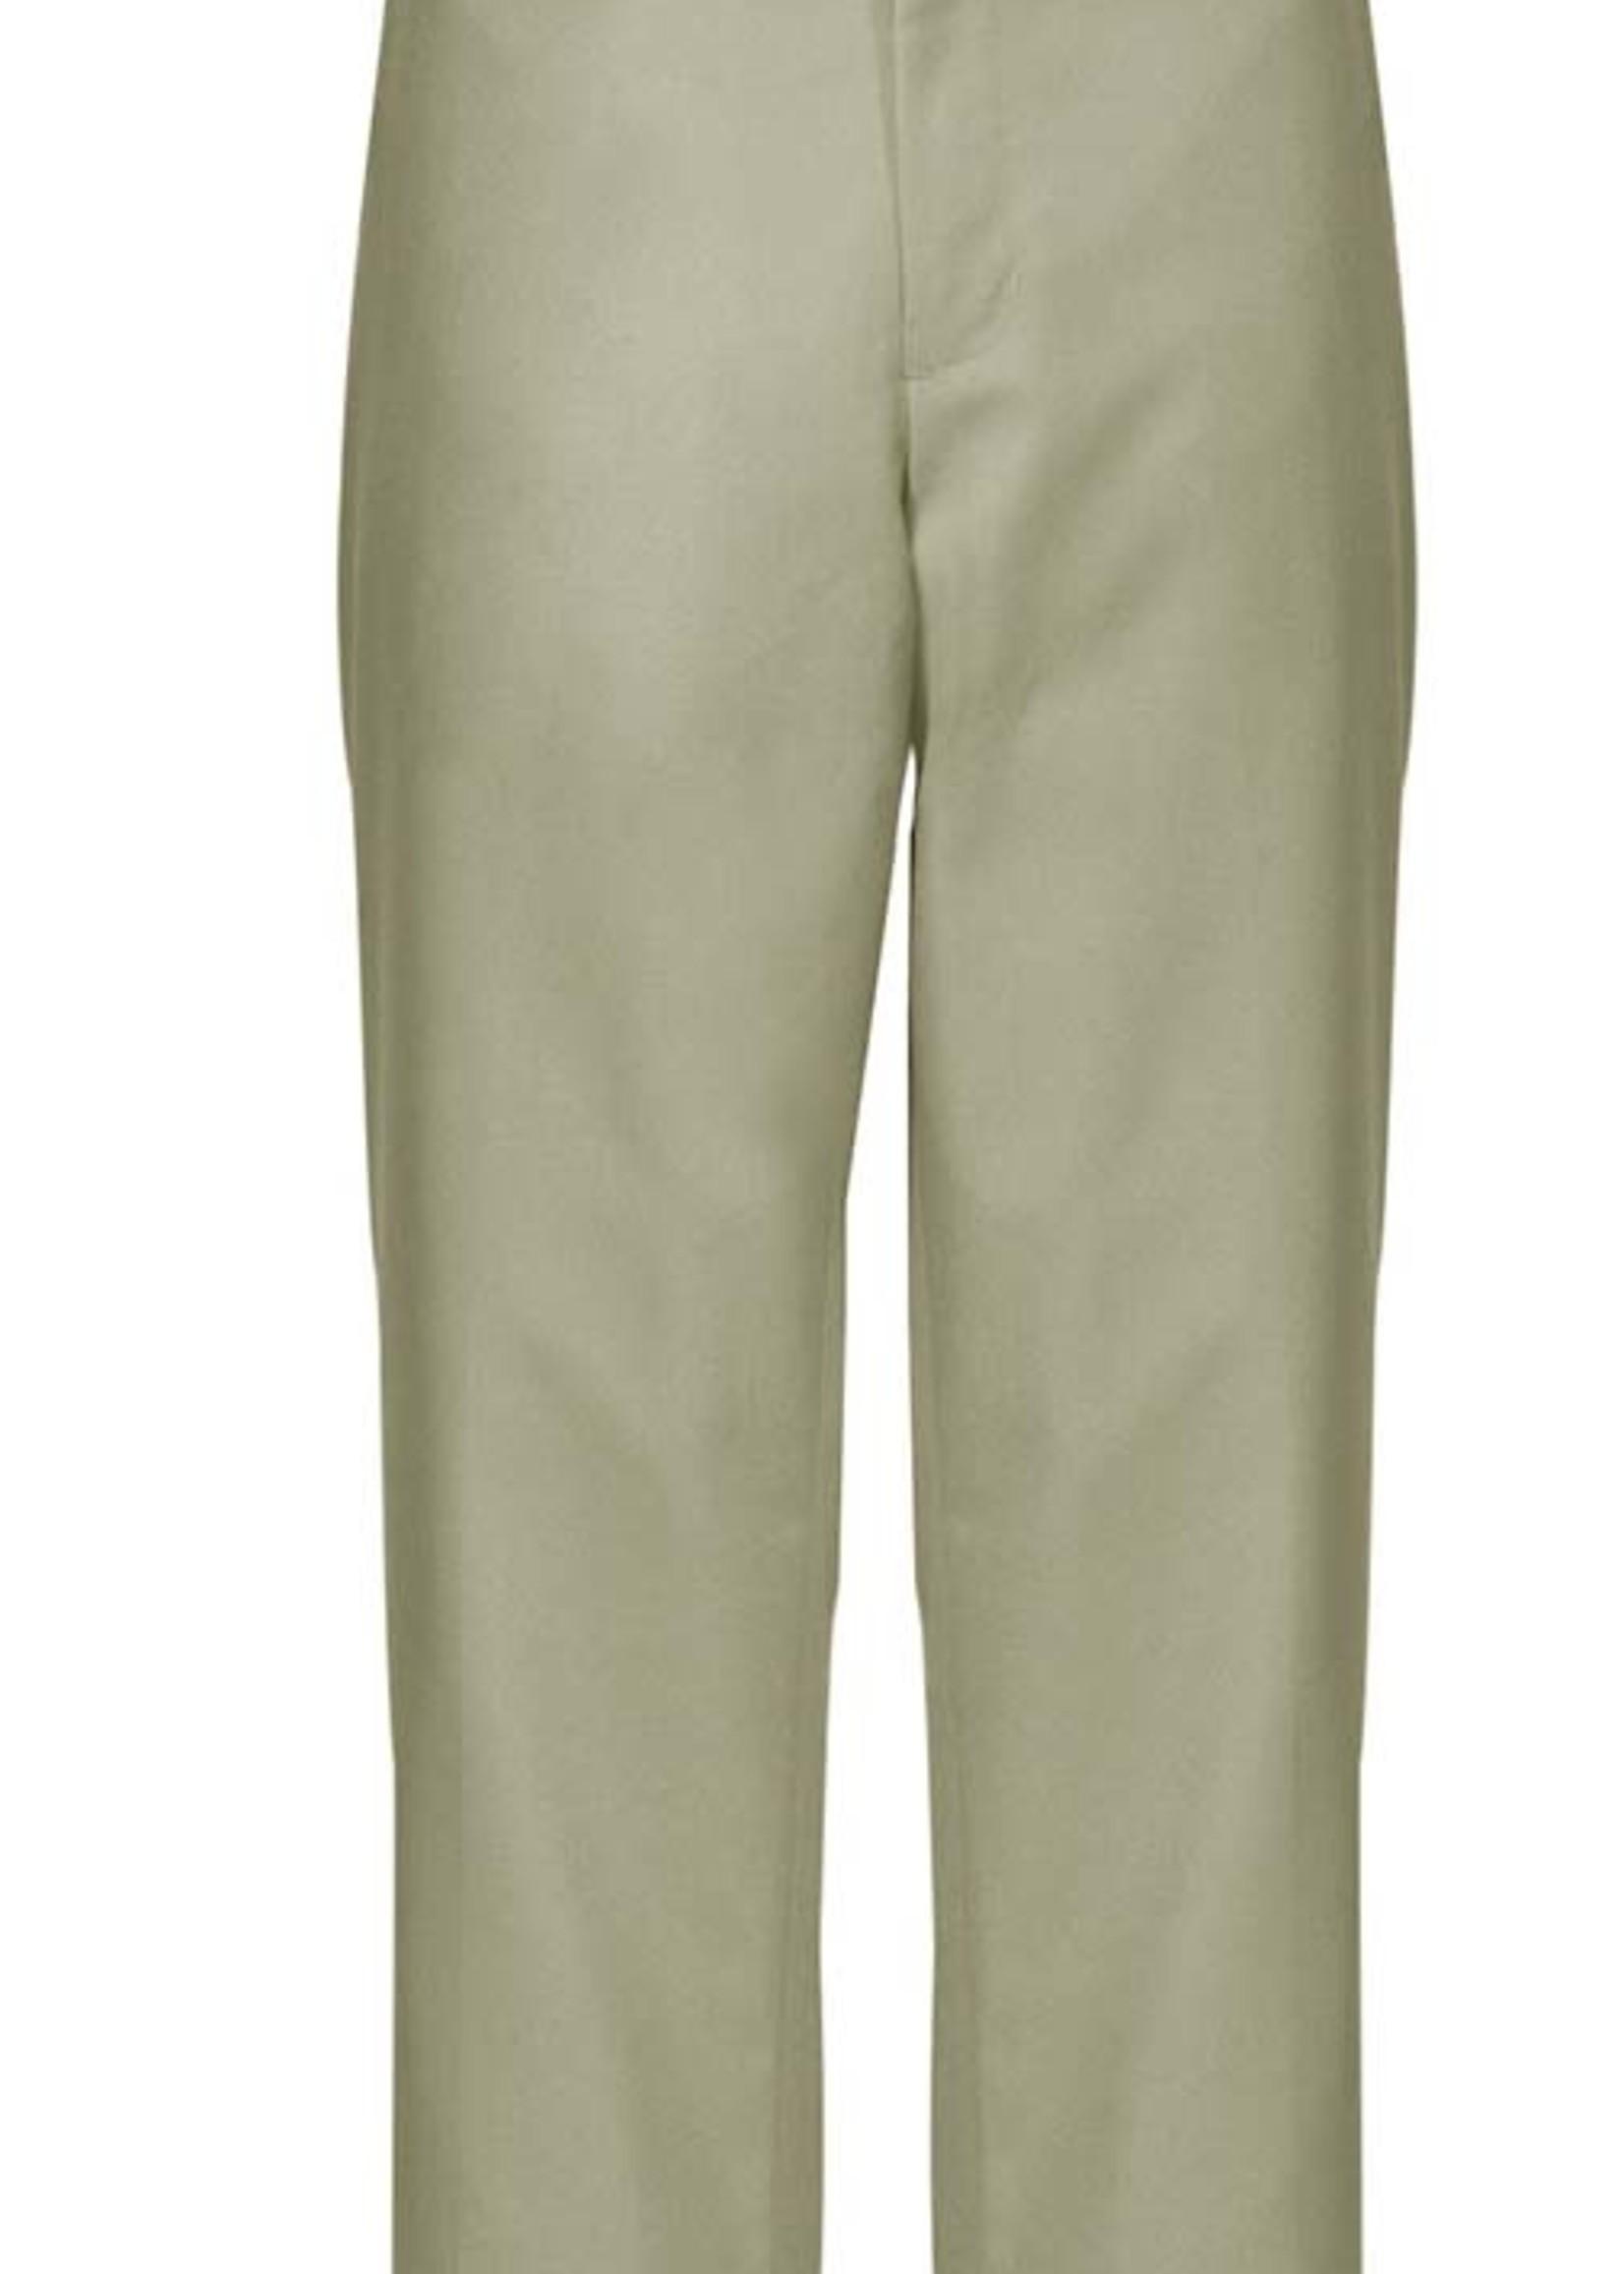 A+ Khaki Flat Front Mens Pants